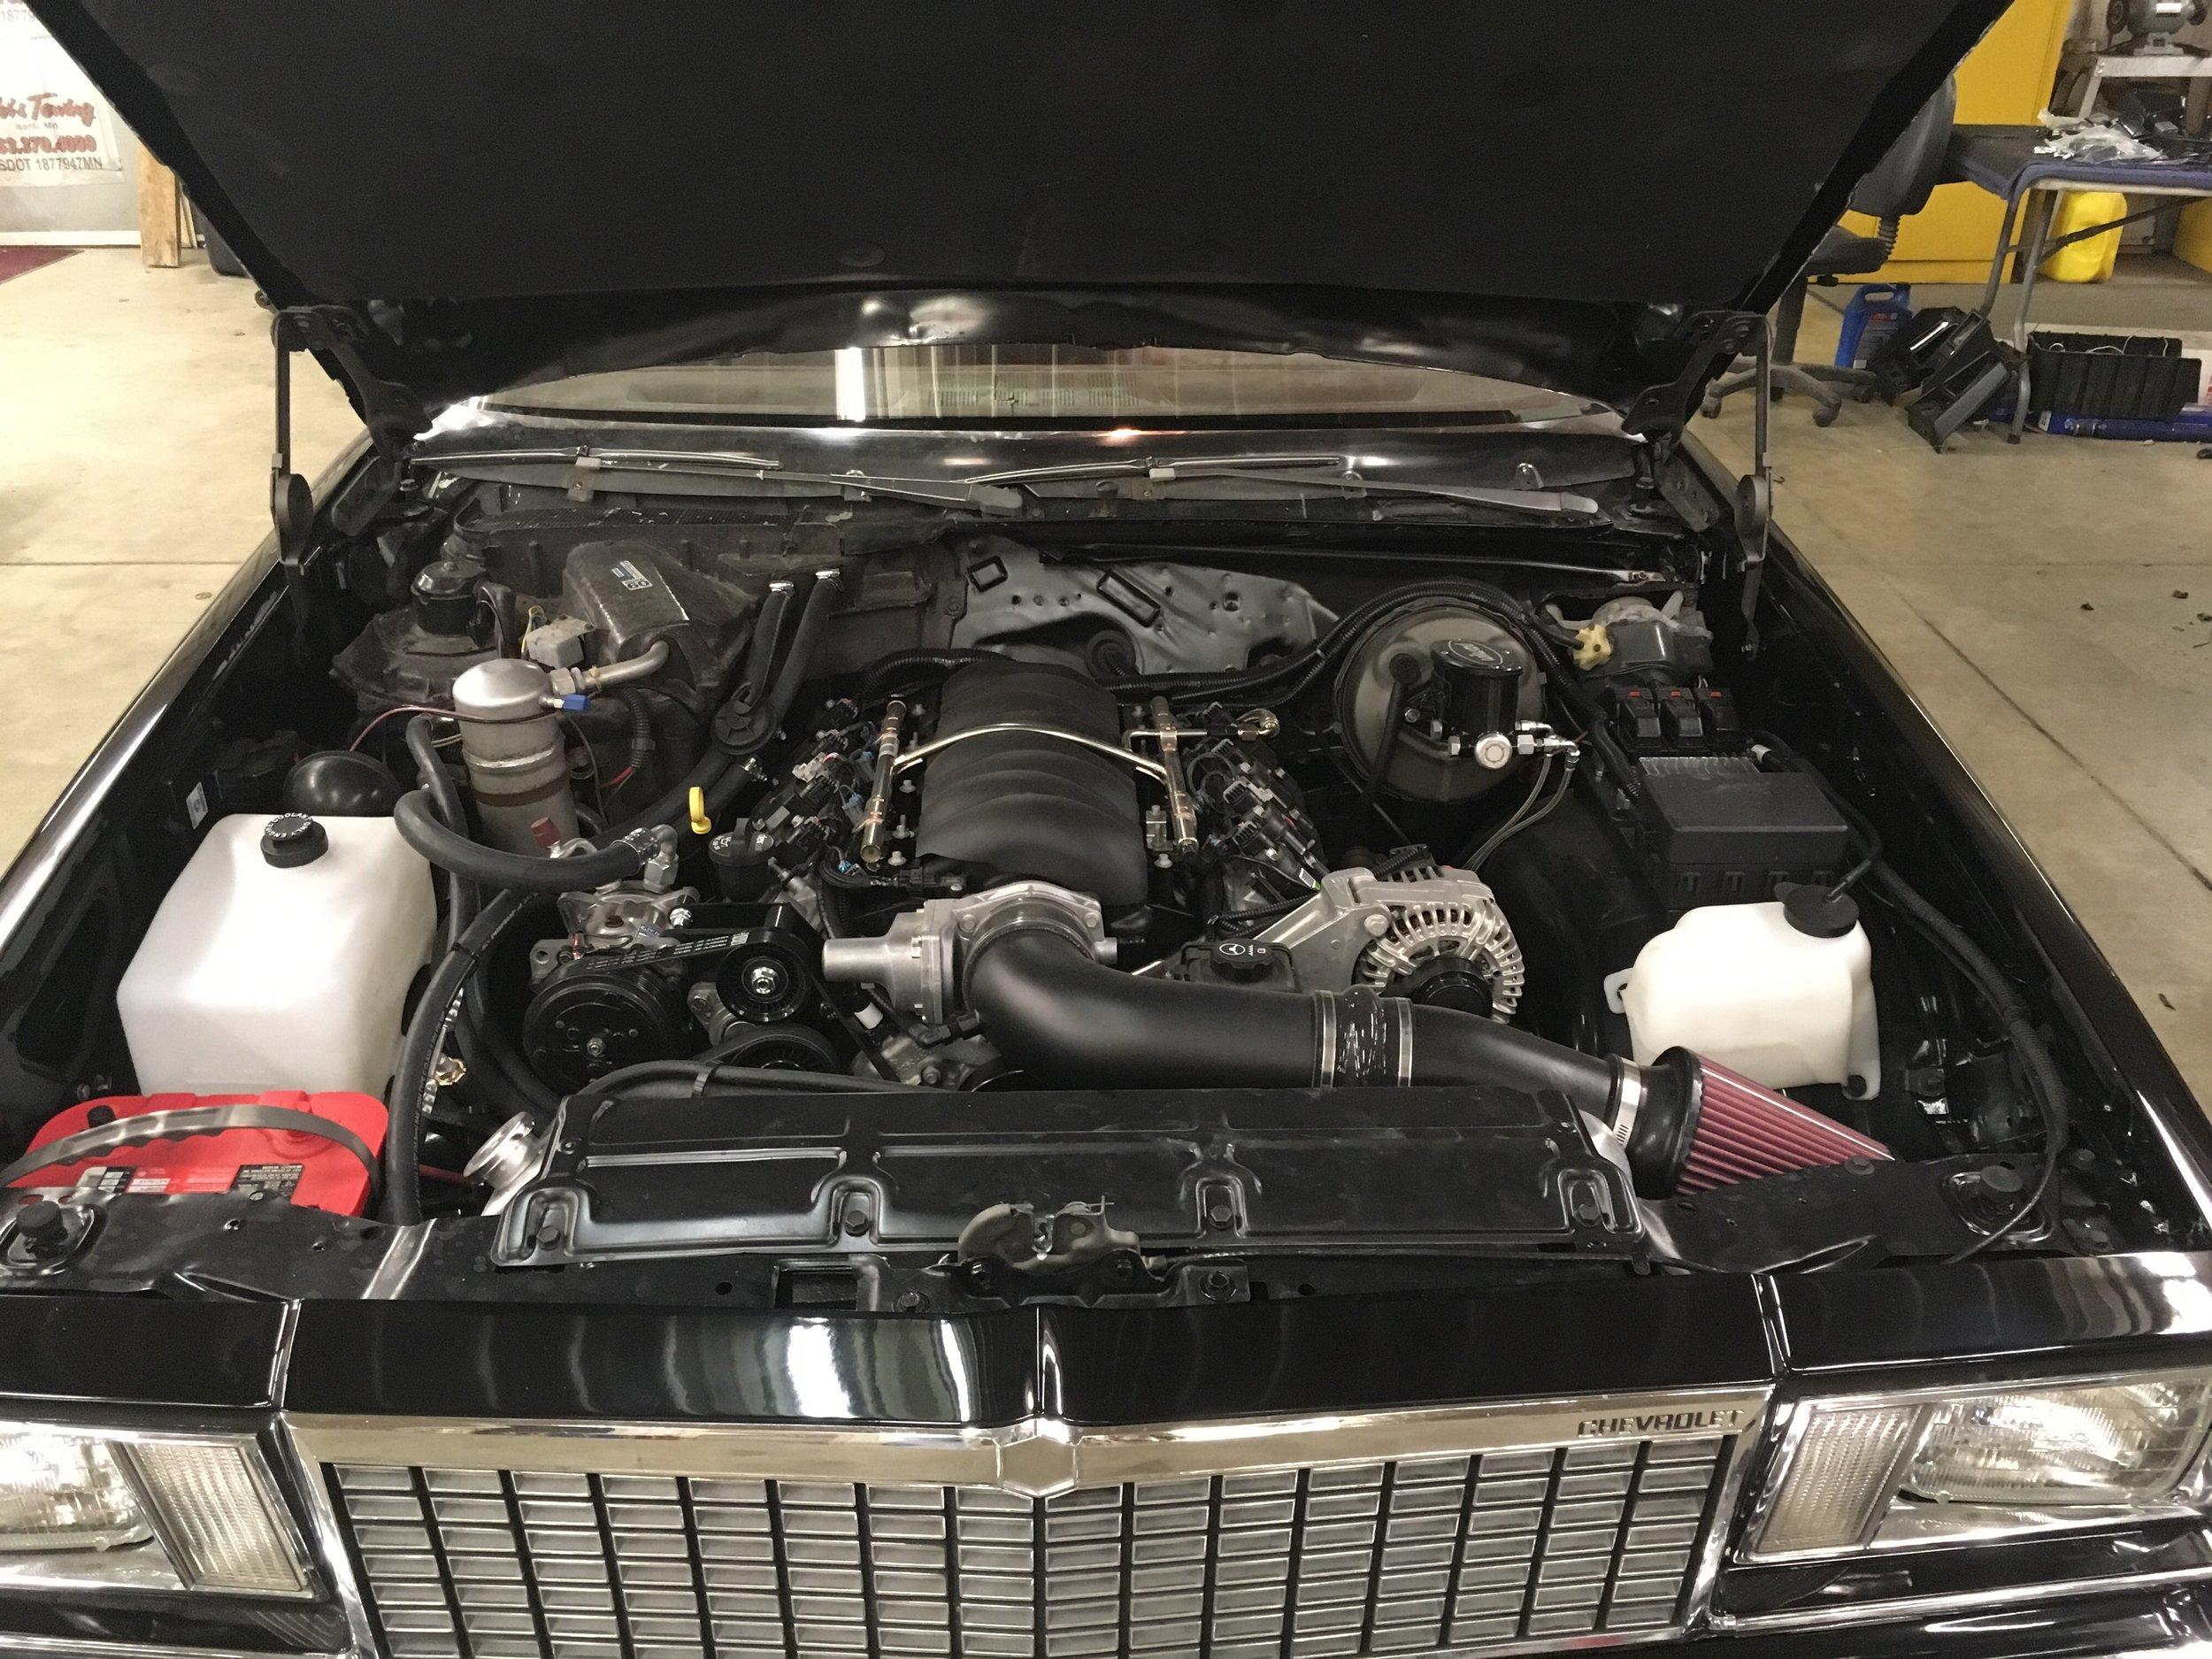 1978-Malibu-minneapolis-hot-rod-custom-car-restoration-5.jpg